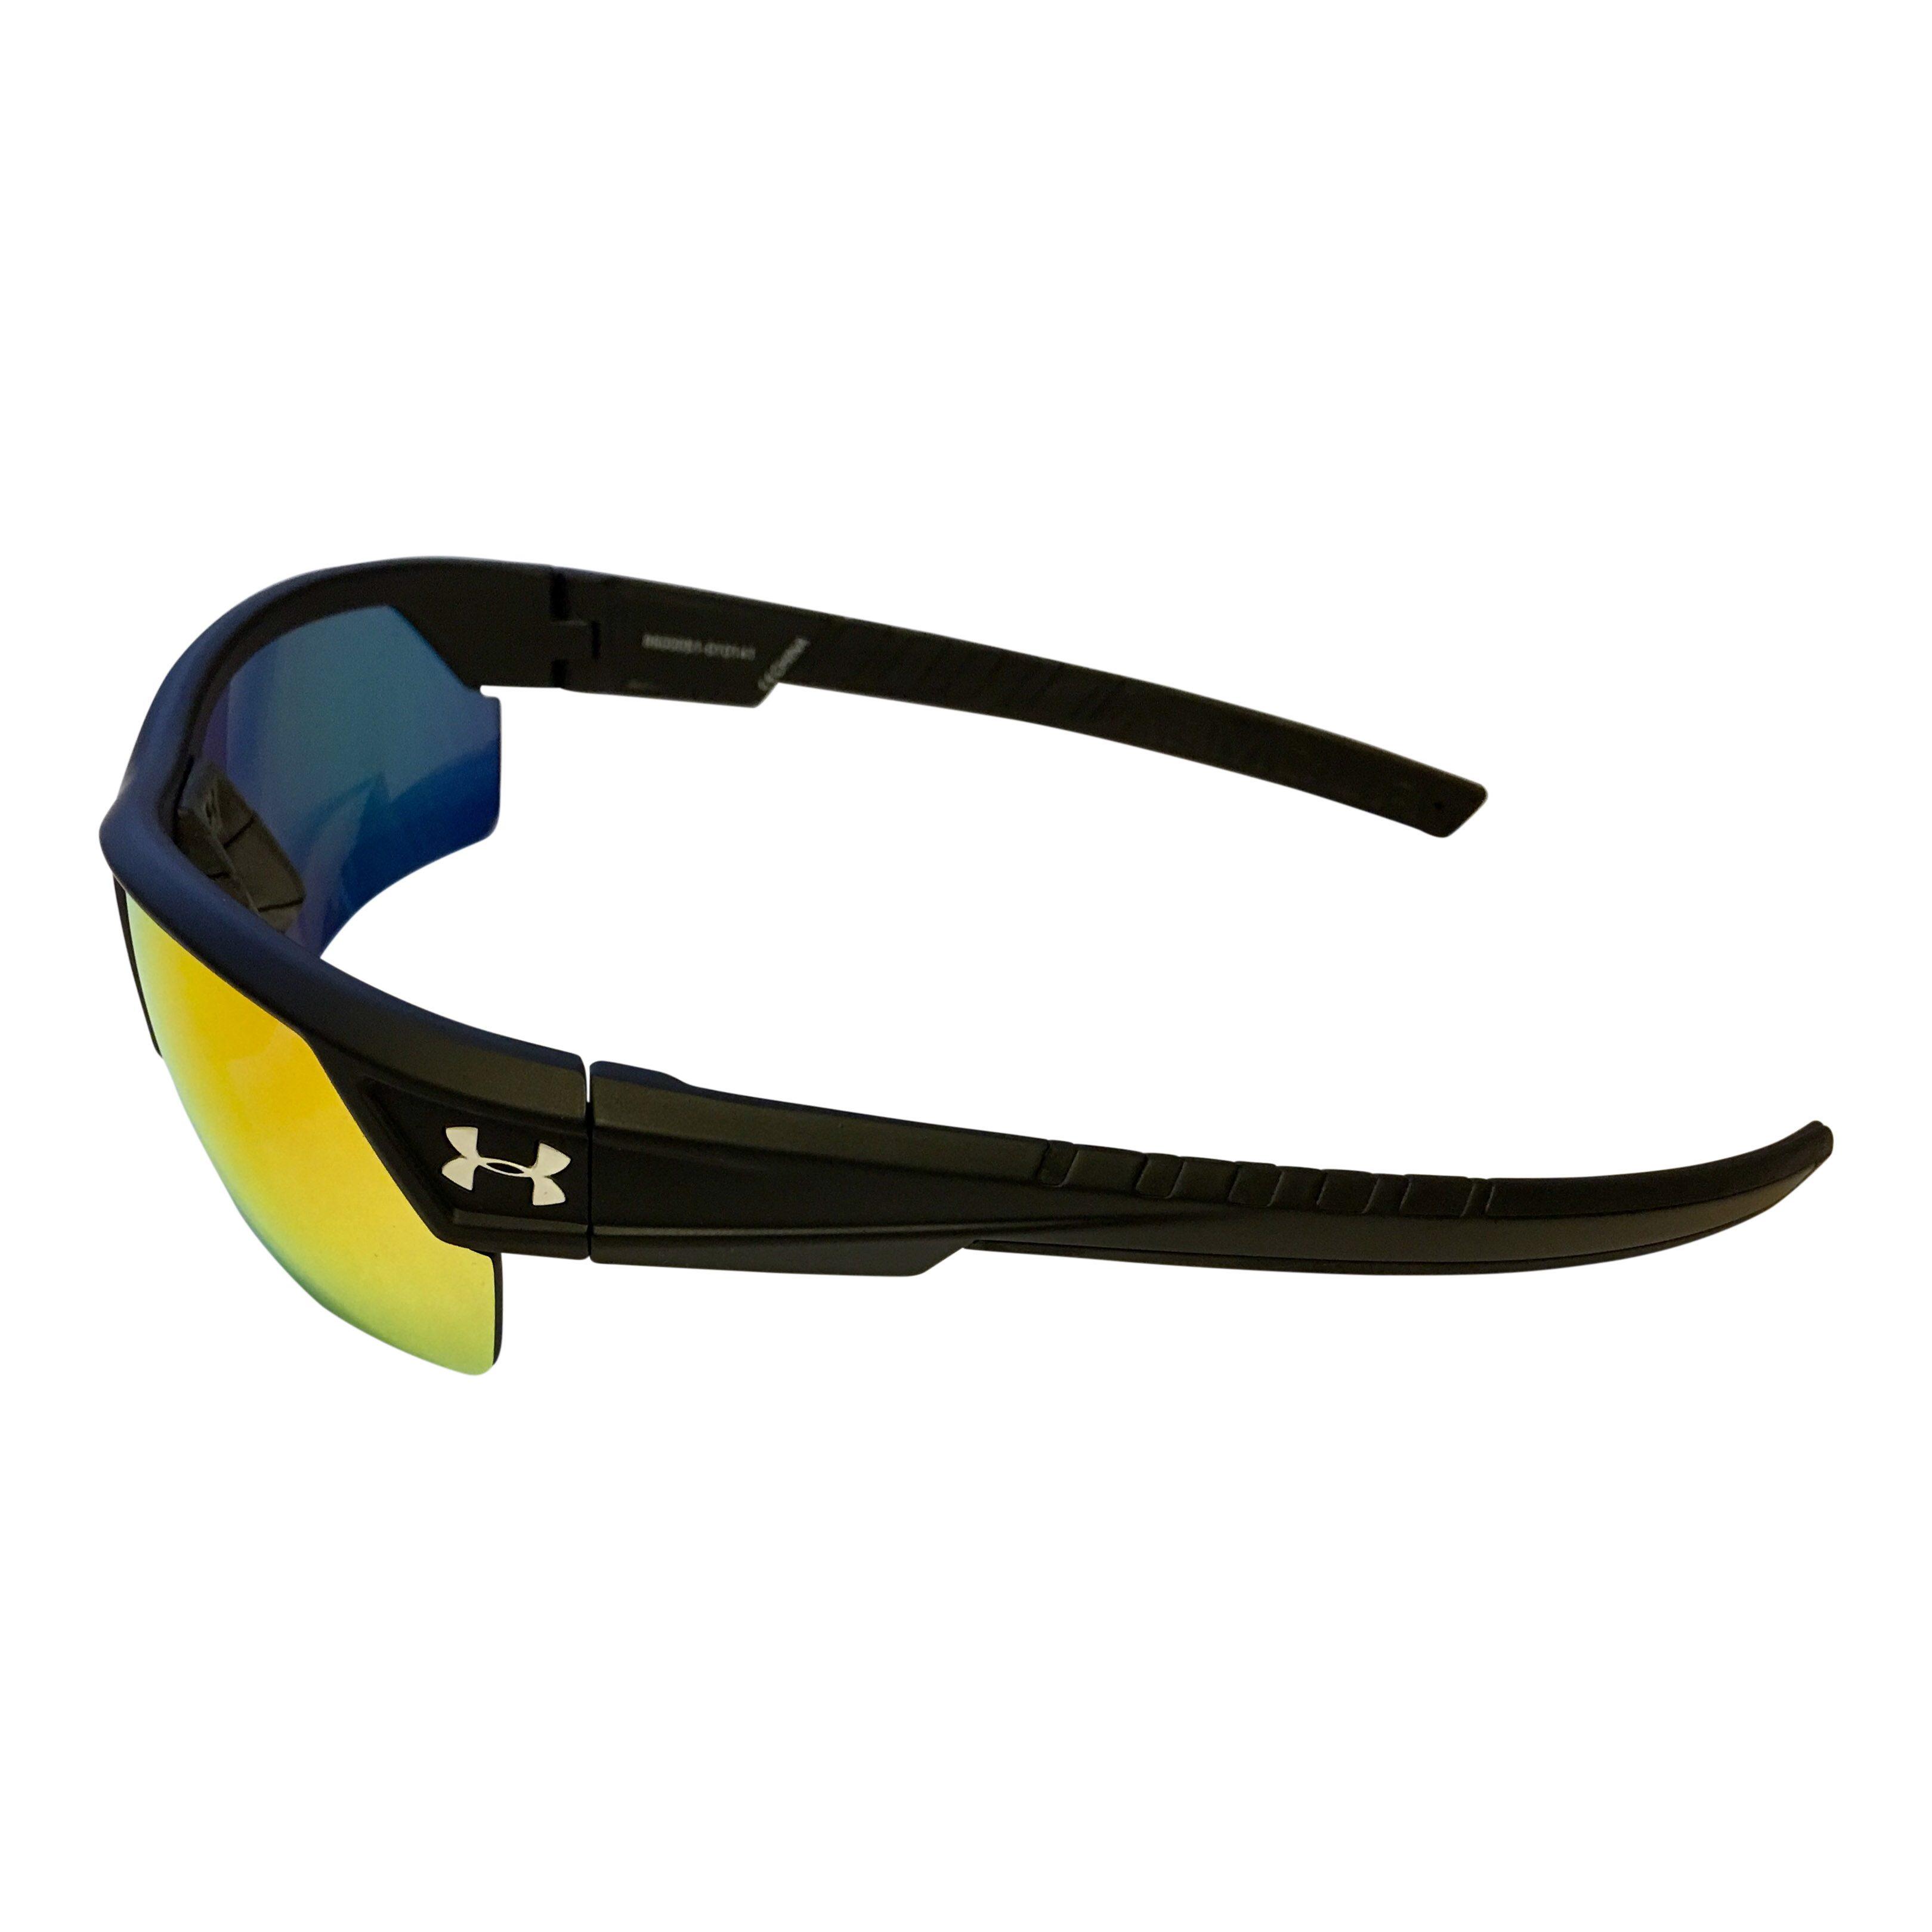 34e5a8c1b4 Under Armour Igniter 2.0 Sunglasses UA - Satin Black - Orange Multi Mirror